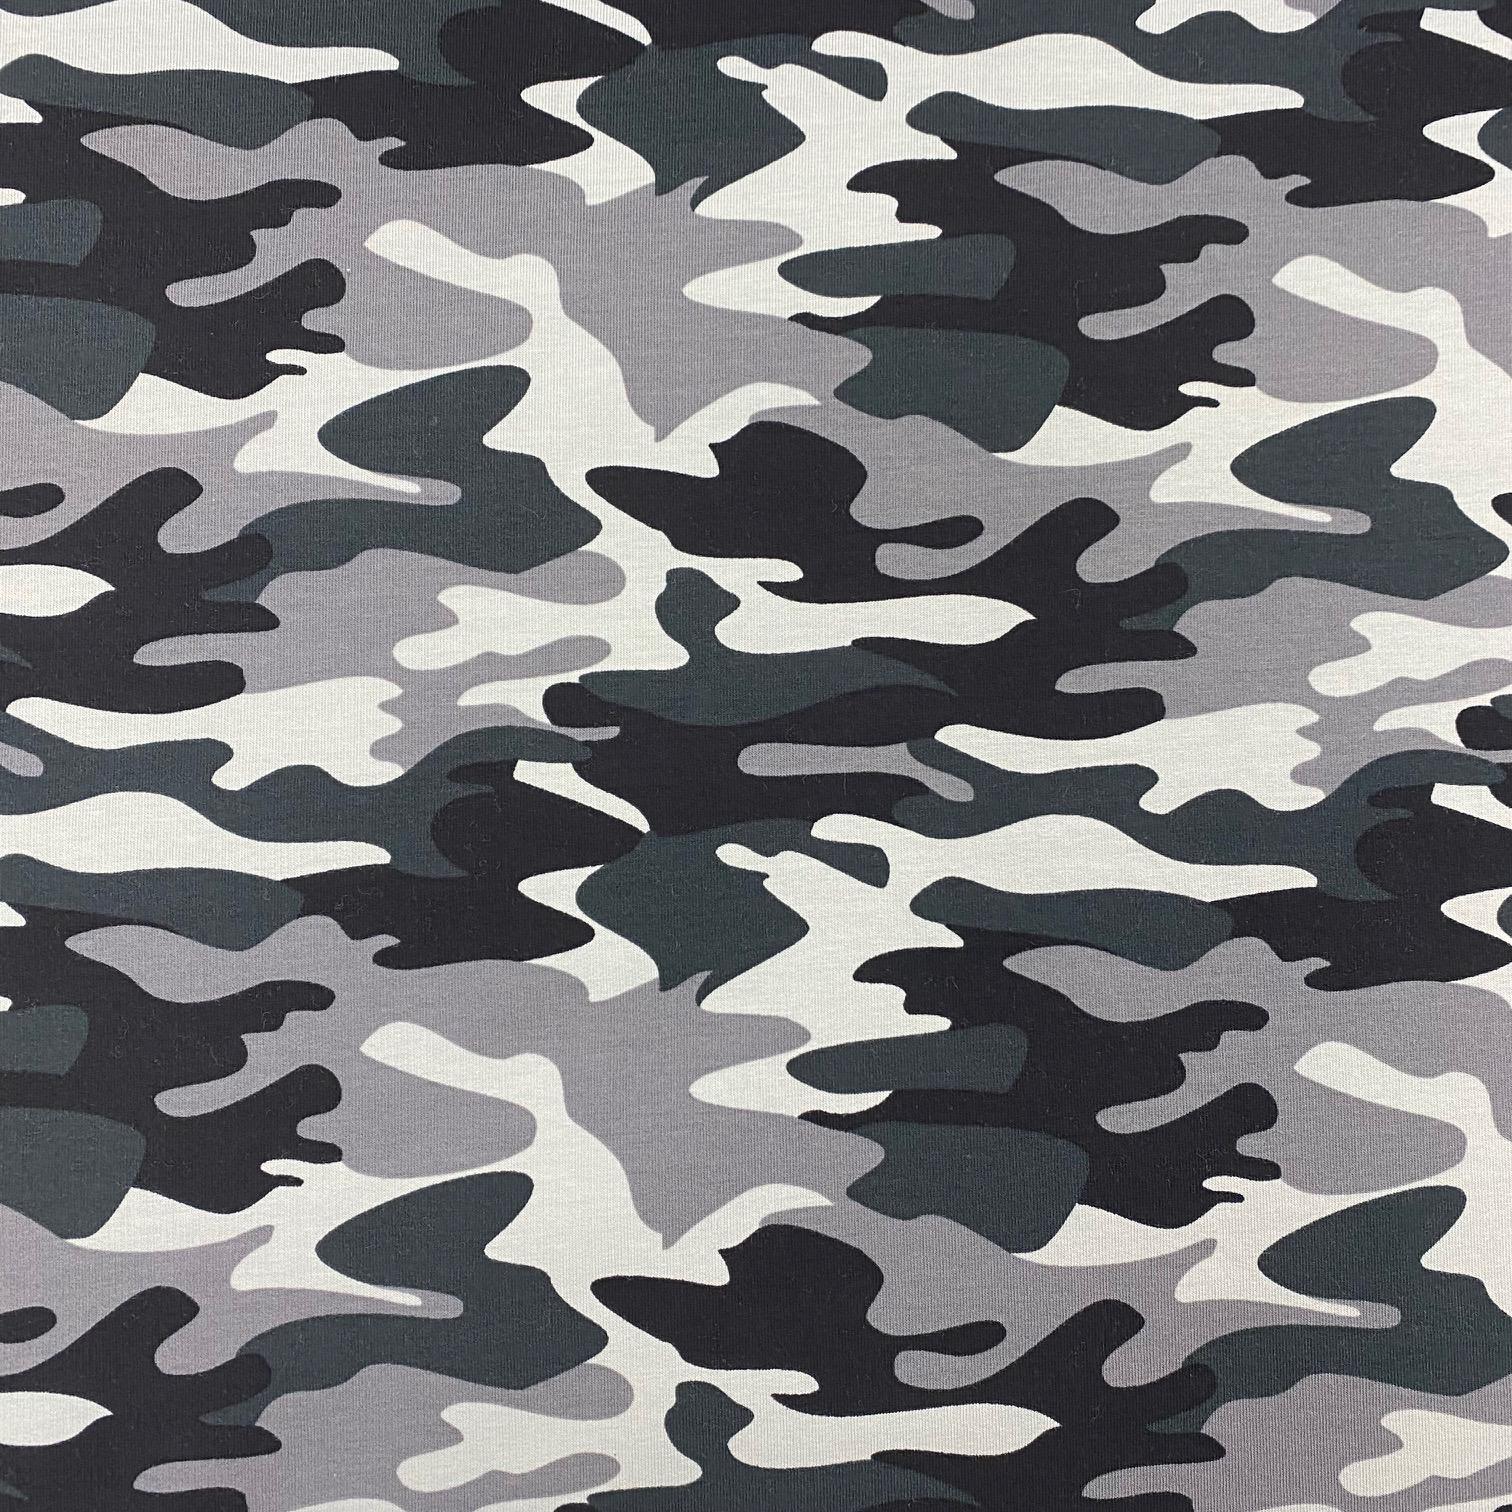 Sweat French Terry, angeraut, Camouflage dunkelgrün/grau.  Art. 4979-1701